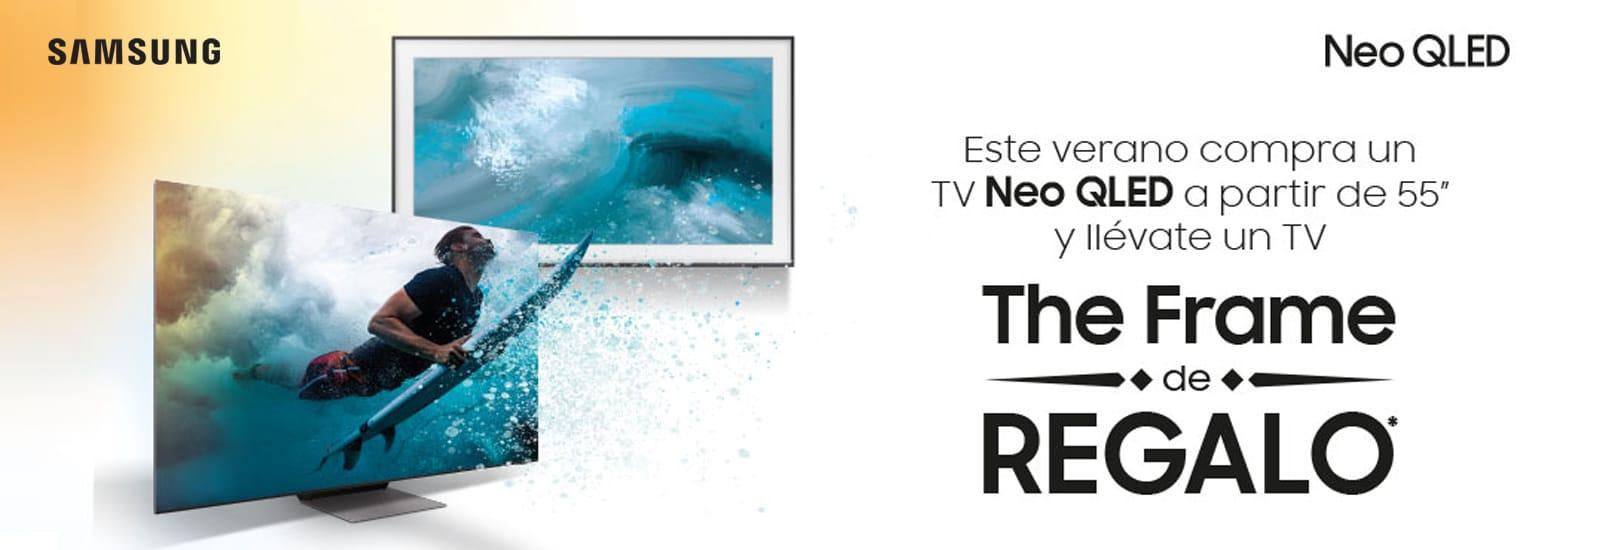 Compra un TV Neo QLED y llévate un The Frame